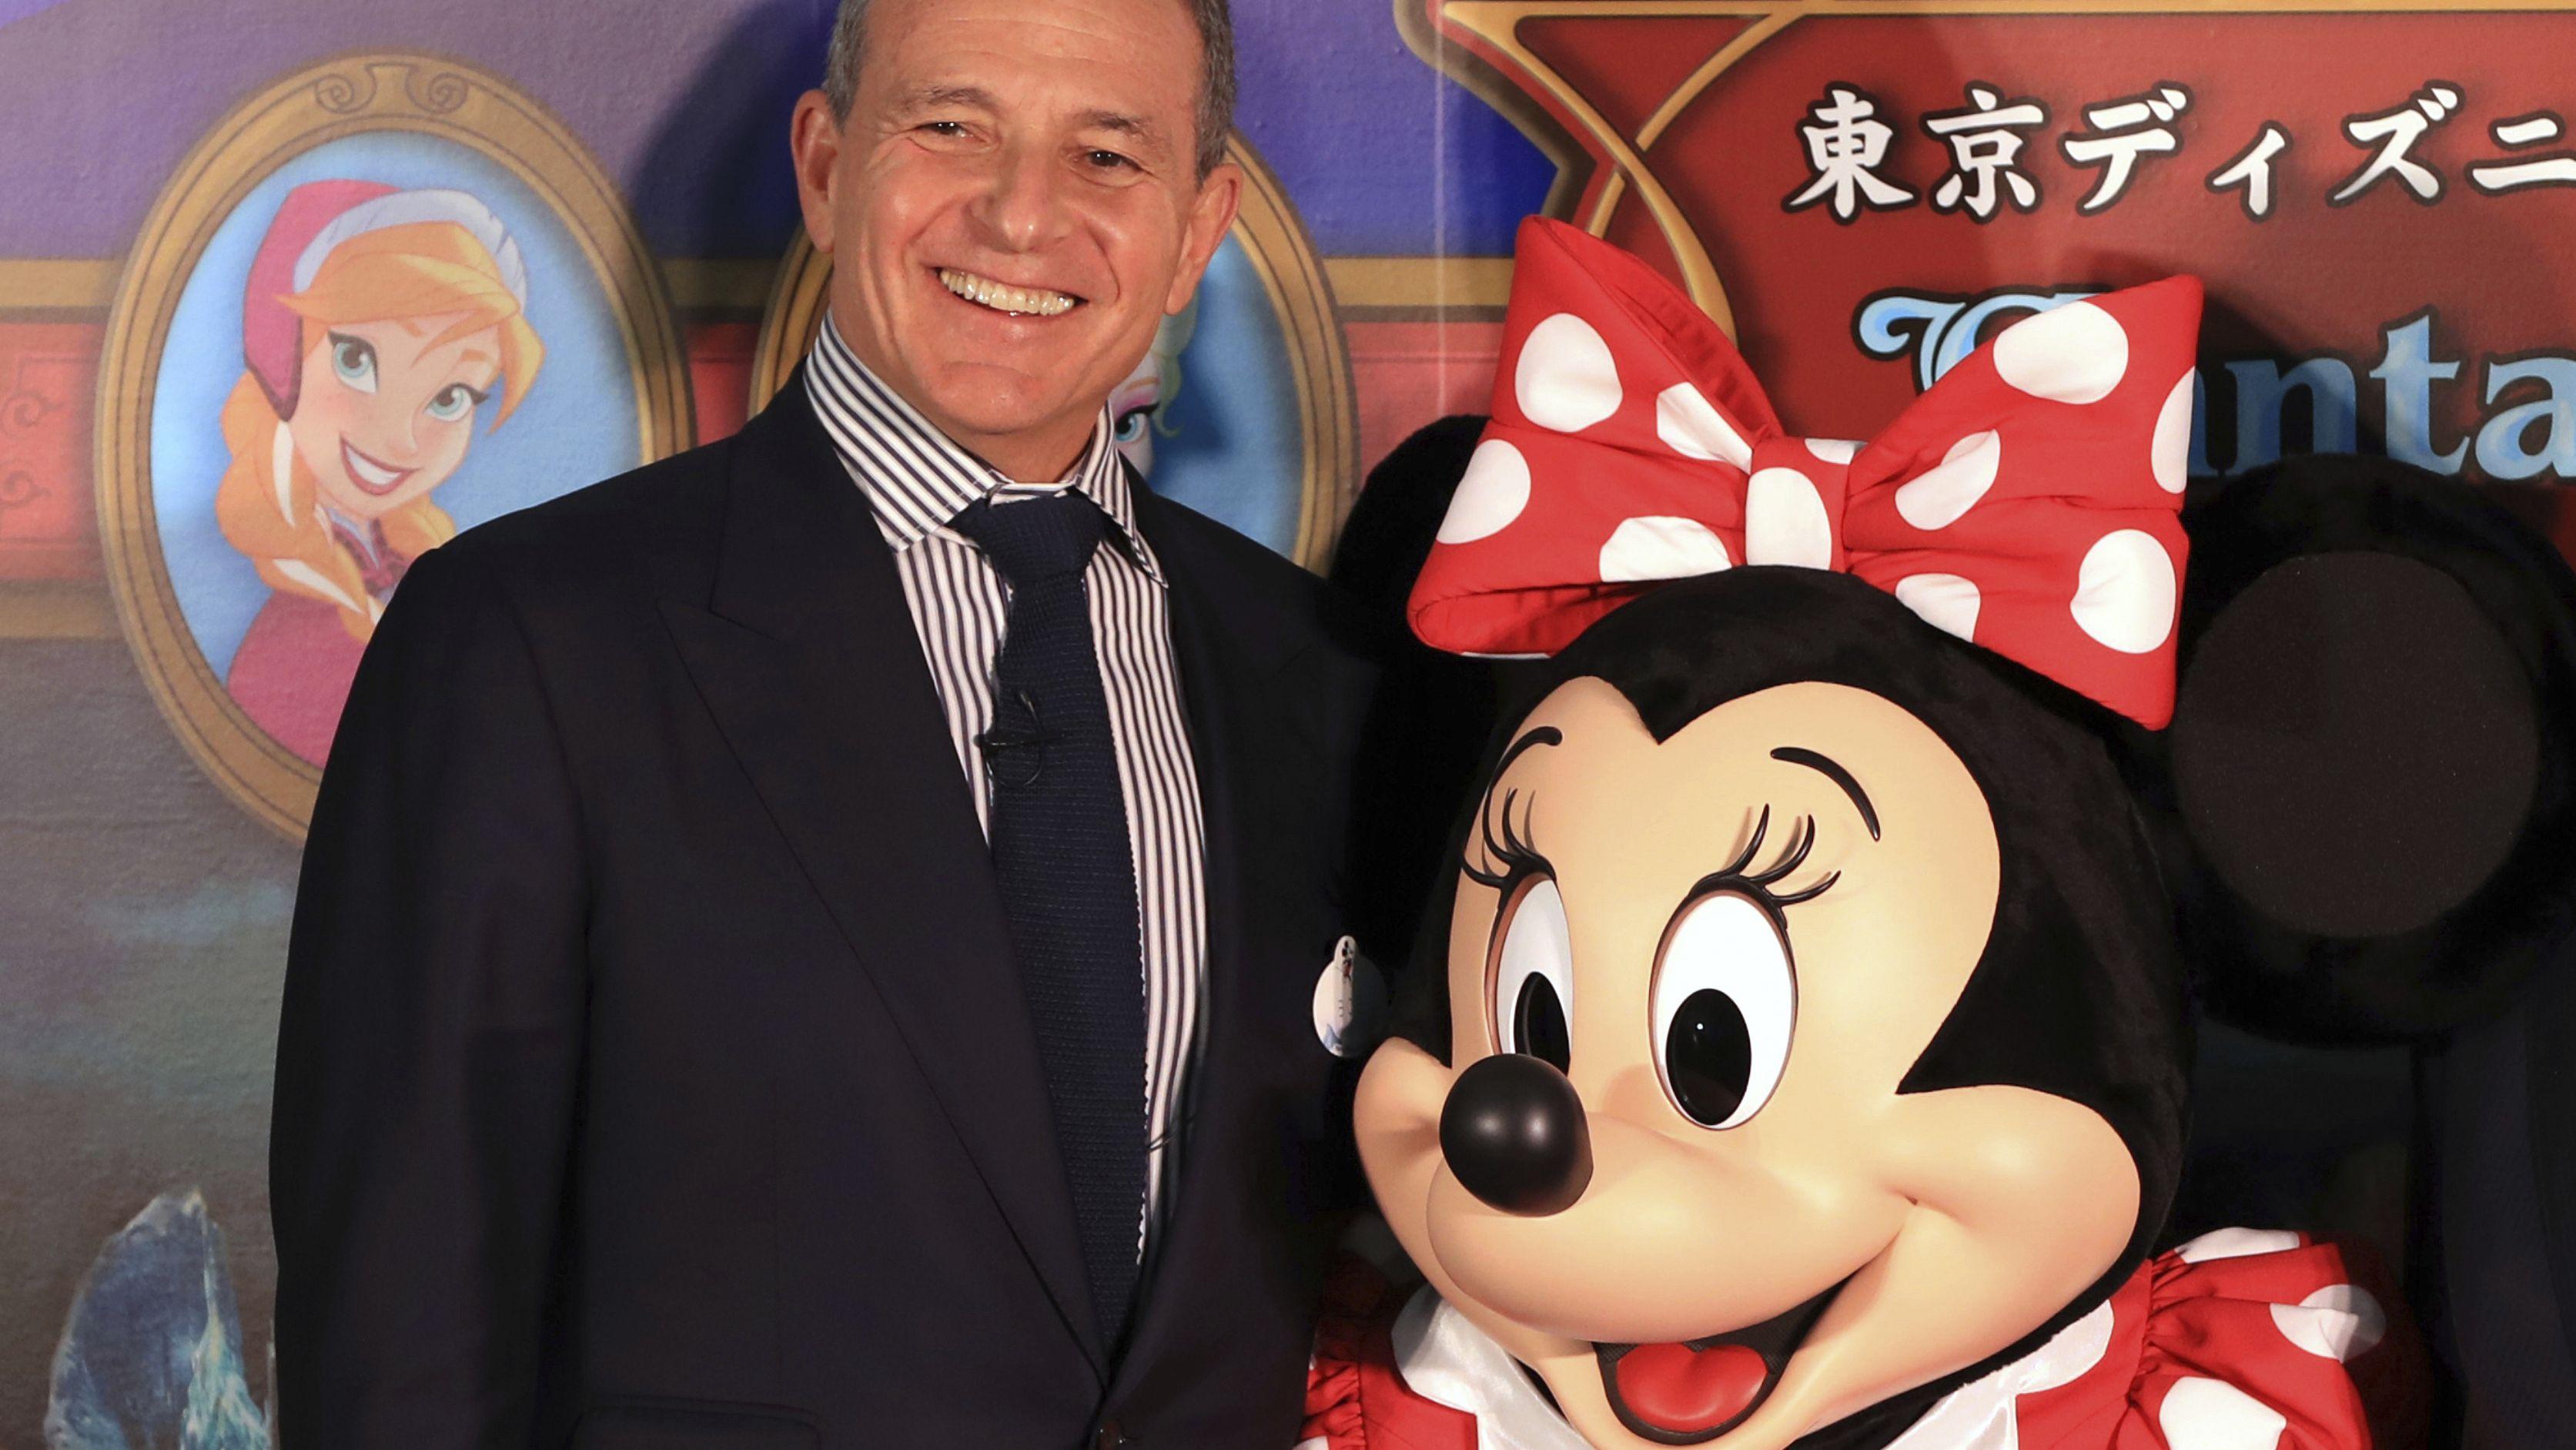 Der bisherige Walt Disney Chef Robert A. Iger